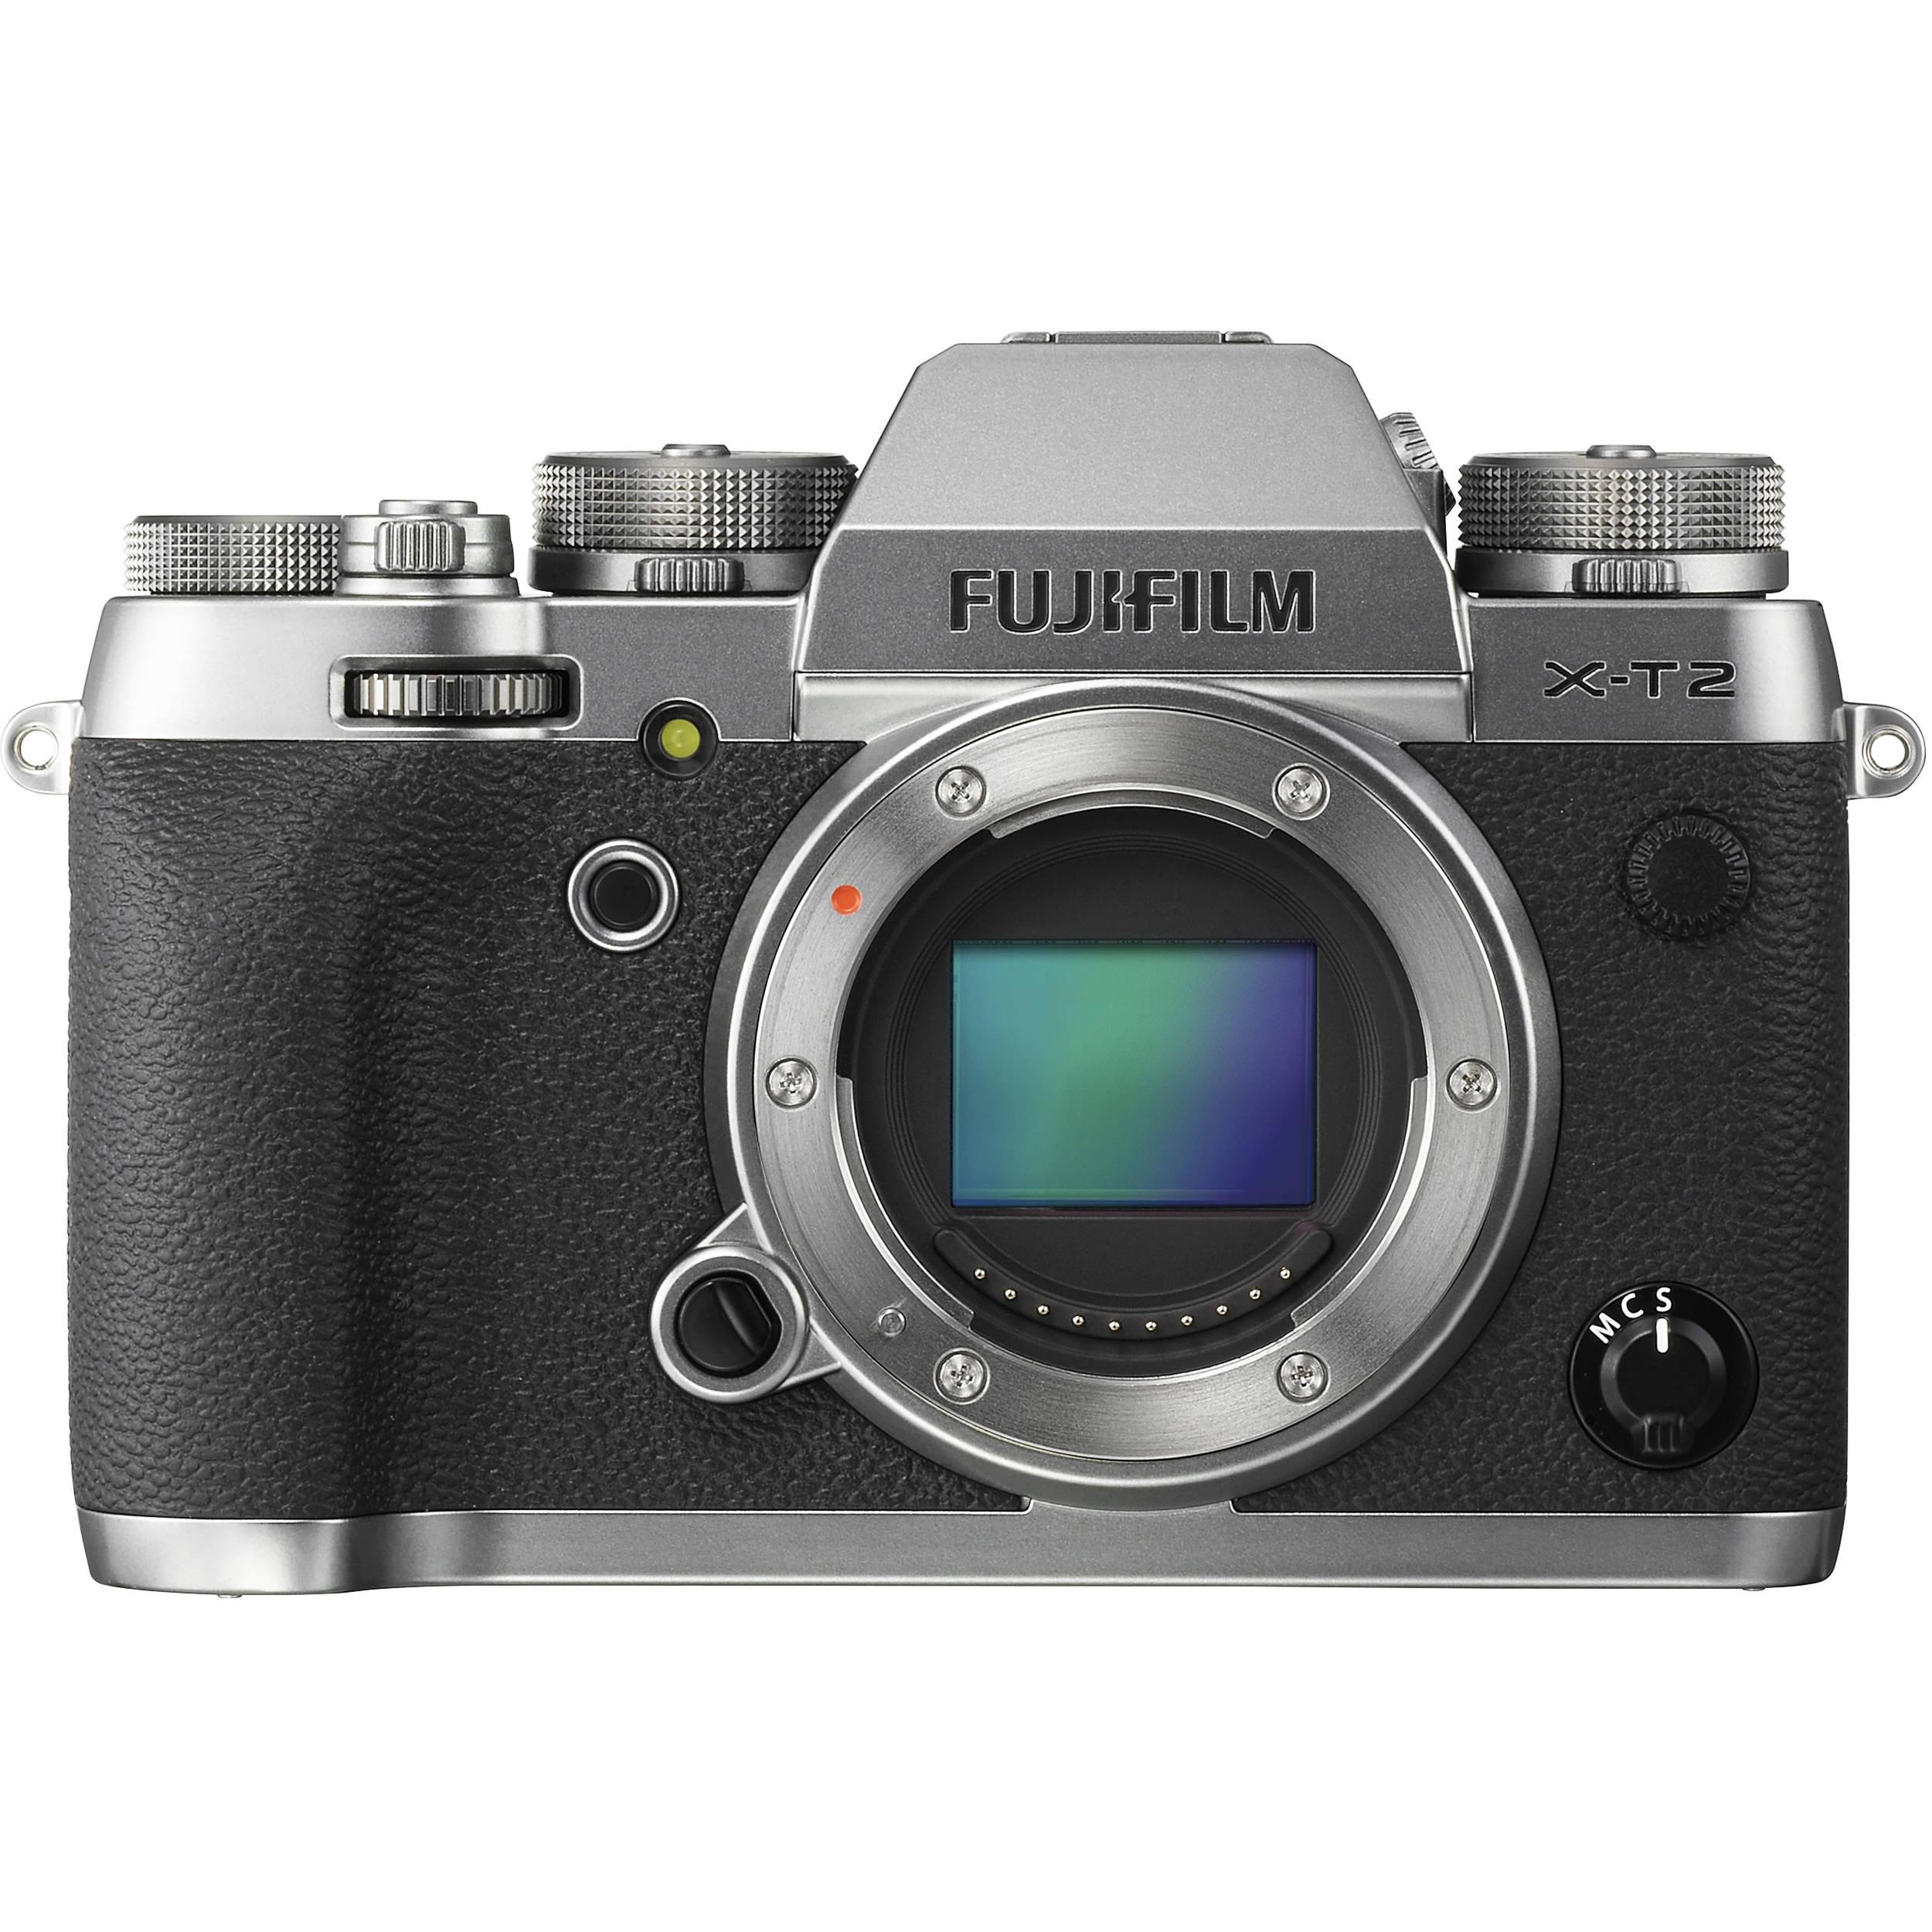 FUJIFILM X-T2 Graphite Silver Edition + dárkový set v hodnotě 5 300,- Kč